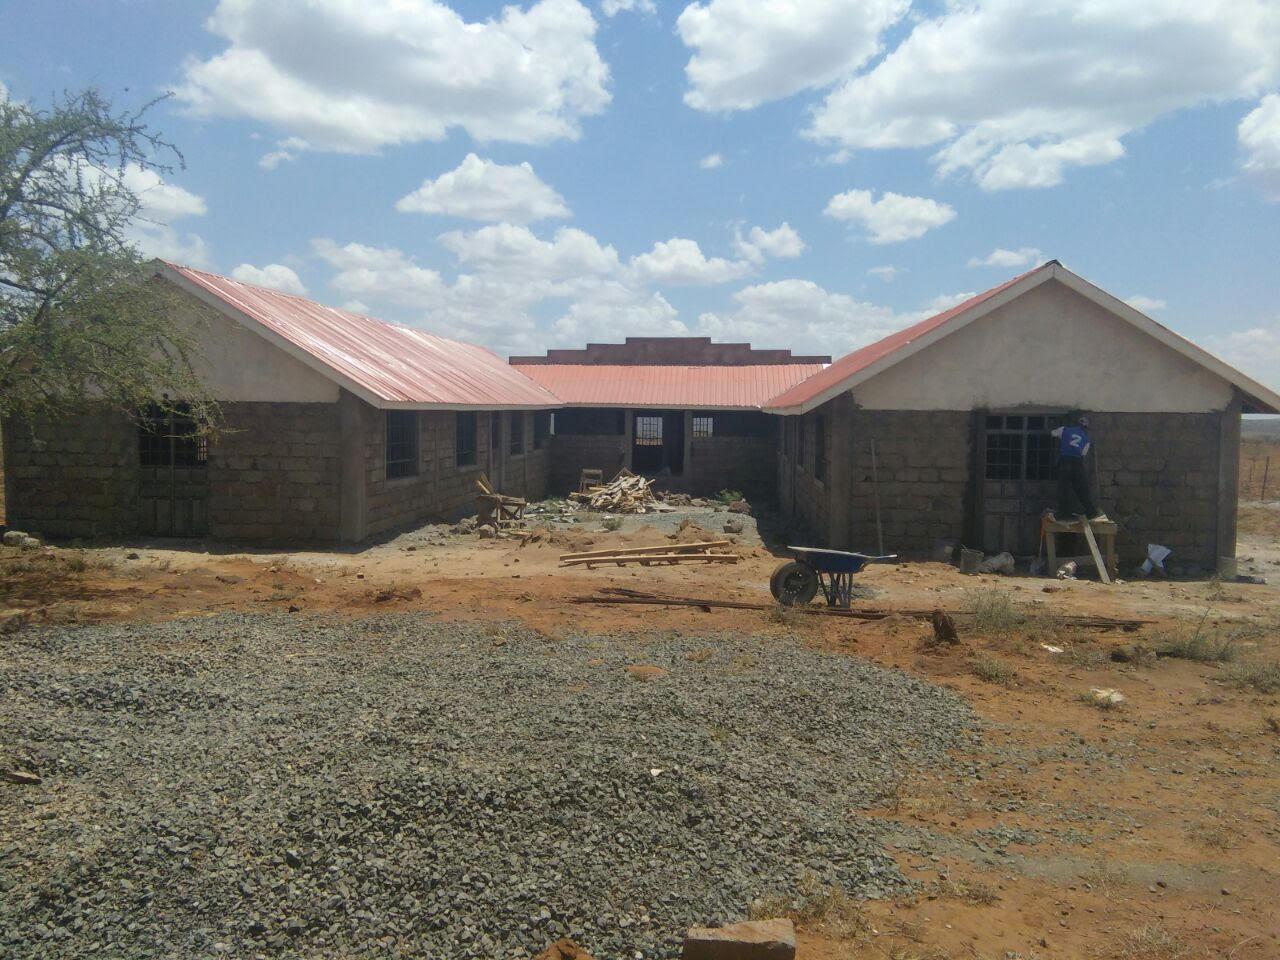 Location 2: Maridhiano Home  - Saikeri (20 miles from Nairobi)